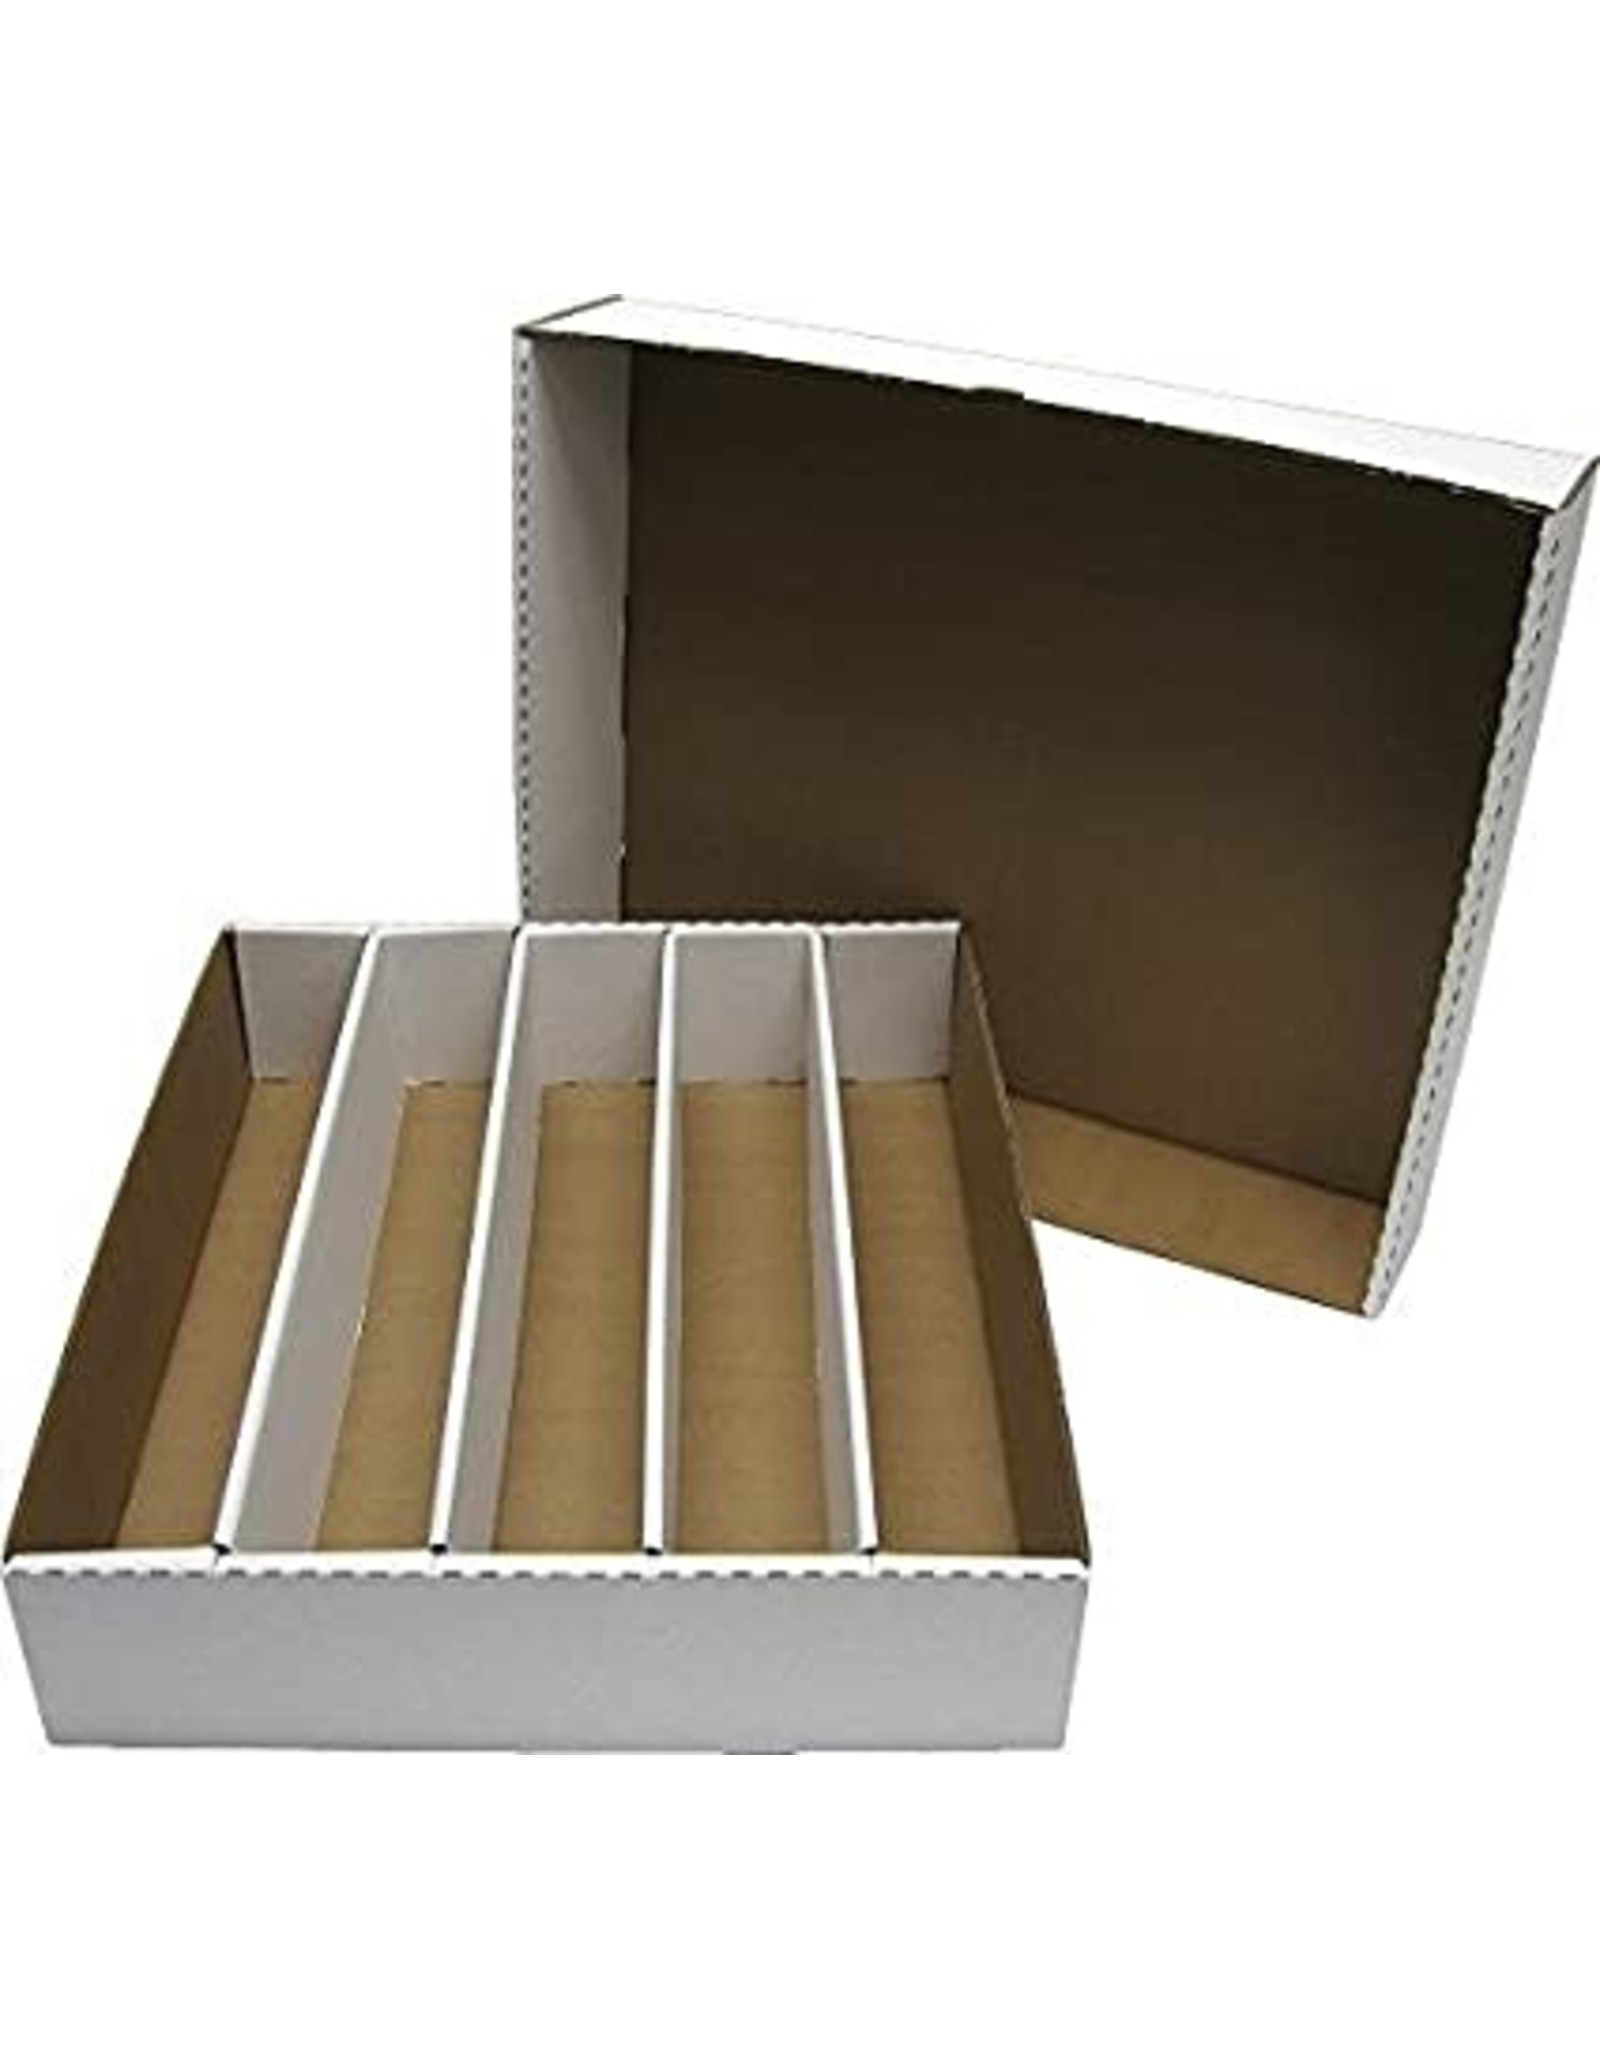 BCW 5000 Count Cardboard Box